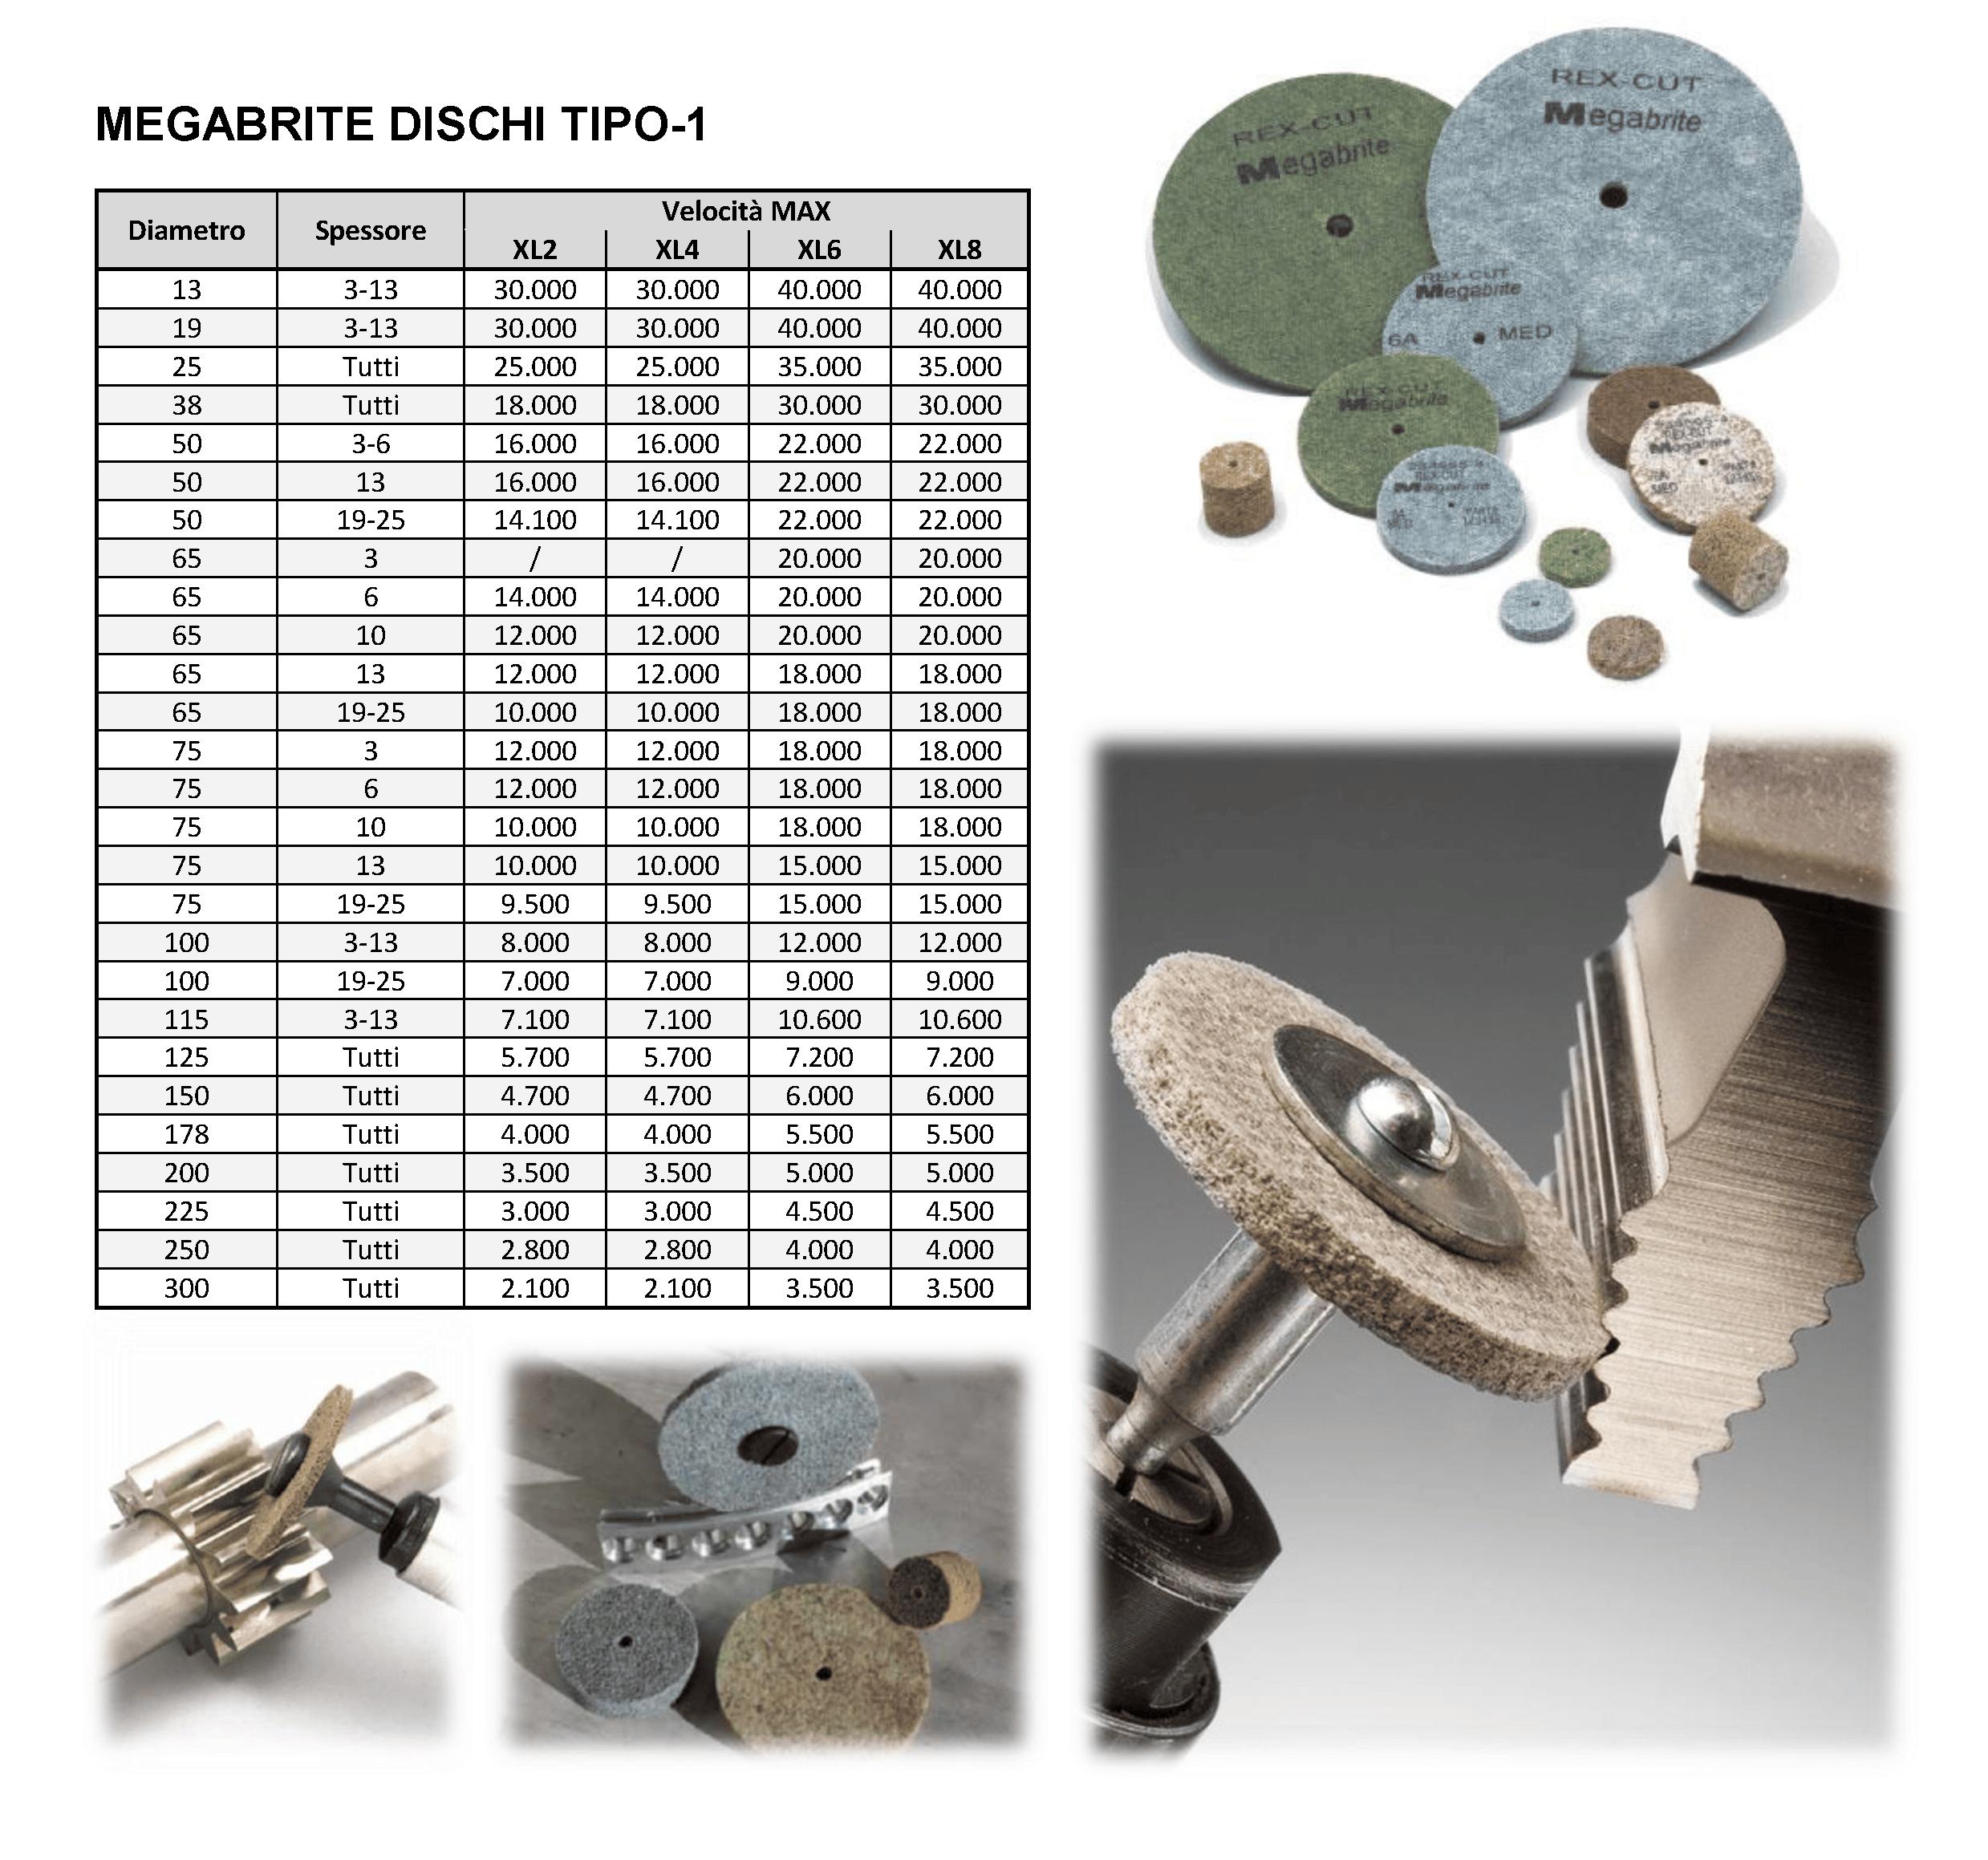 rex-cut-abrasivi-fibra-cotone-abrasivo-dischi-tipo-1-megabrite-unitized